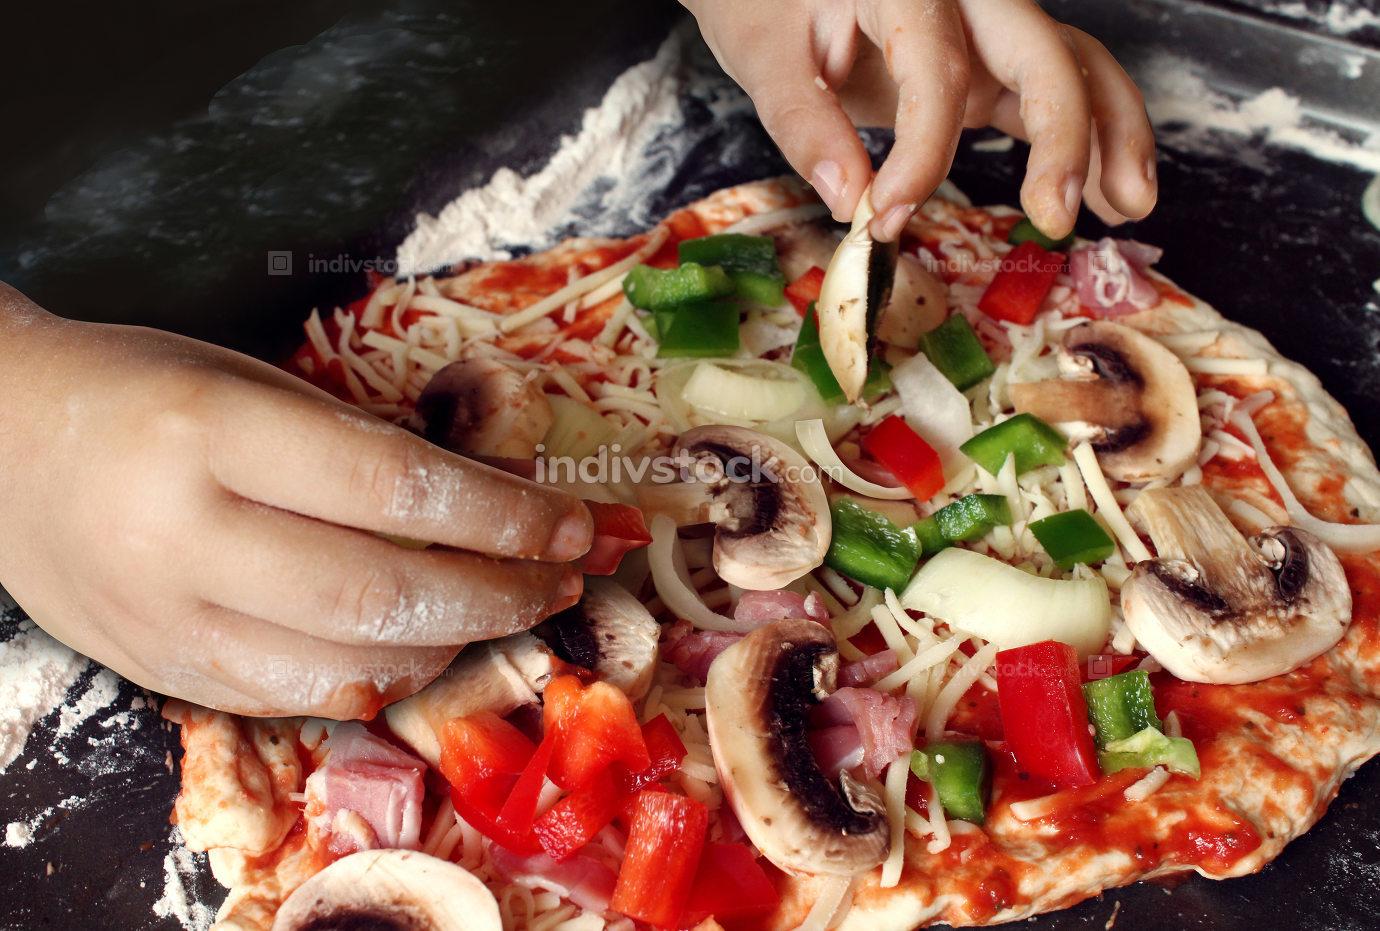 Child Preparing Pizza